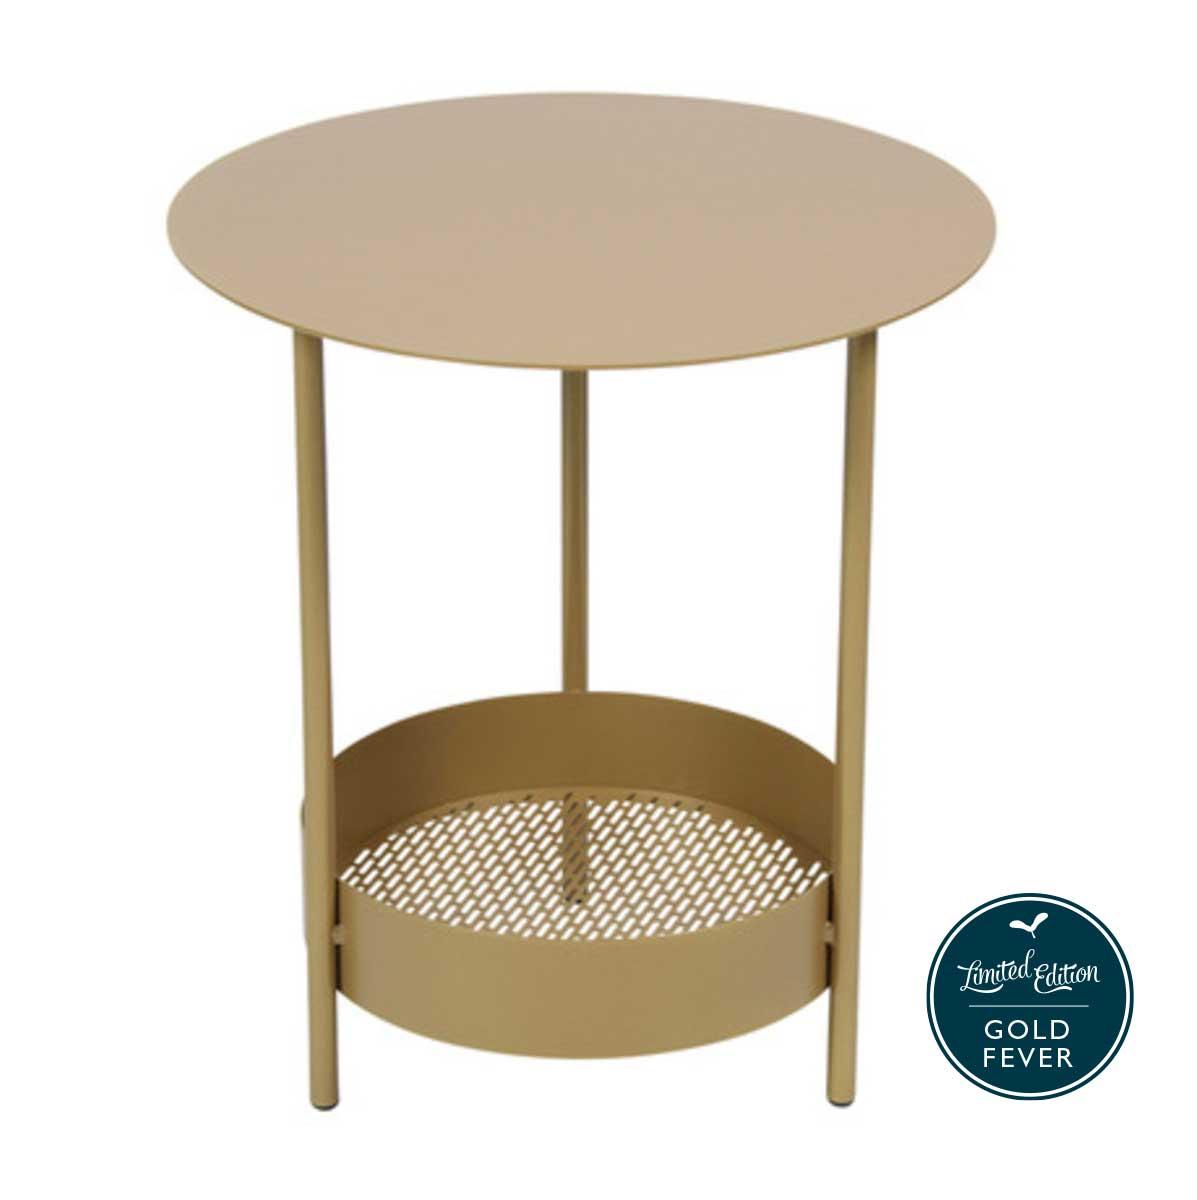 salsa pedestal table